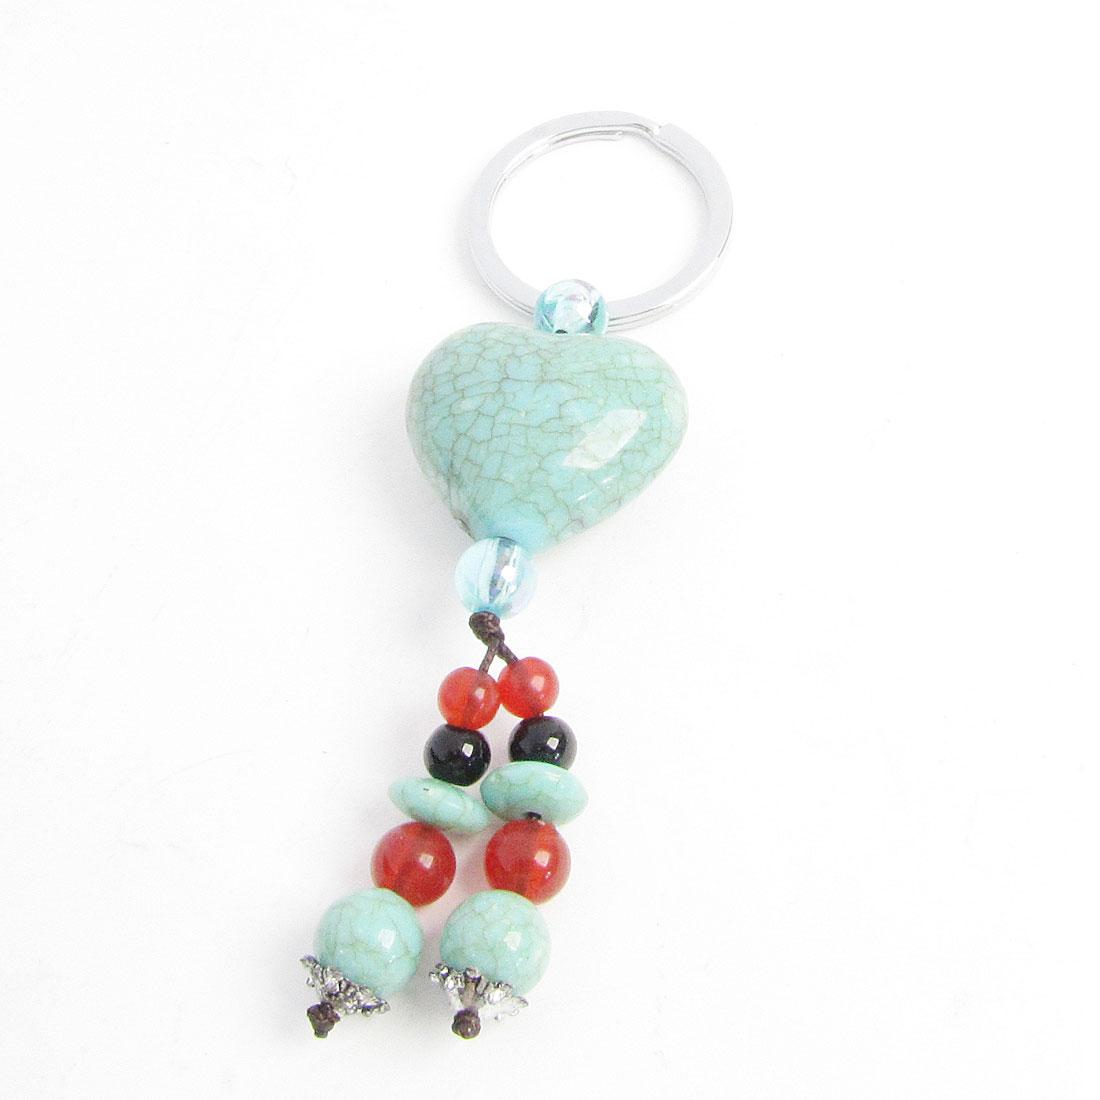 Turquoise Heart Design Plastic Jade Pendant Metal 3cm Dia Keyring Key Ring